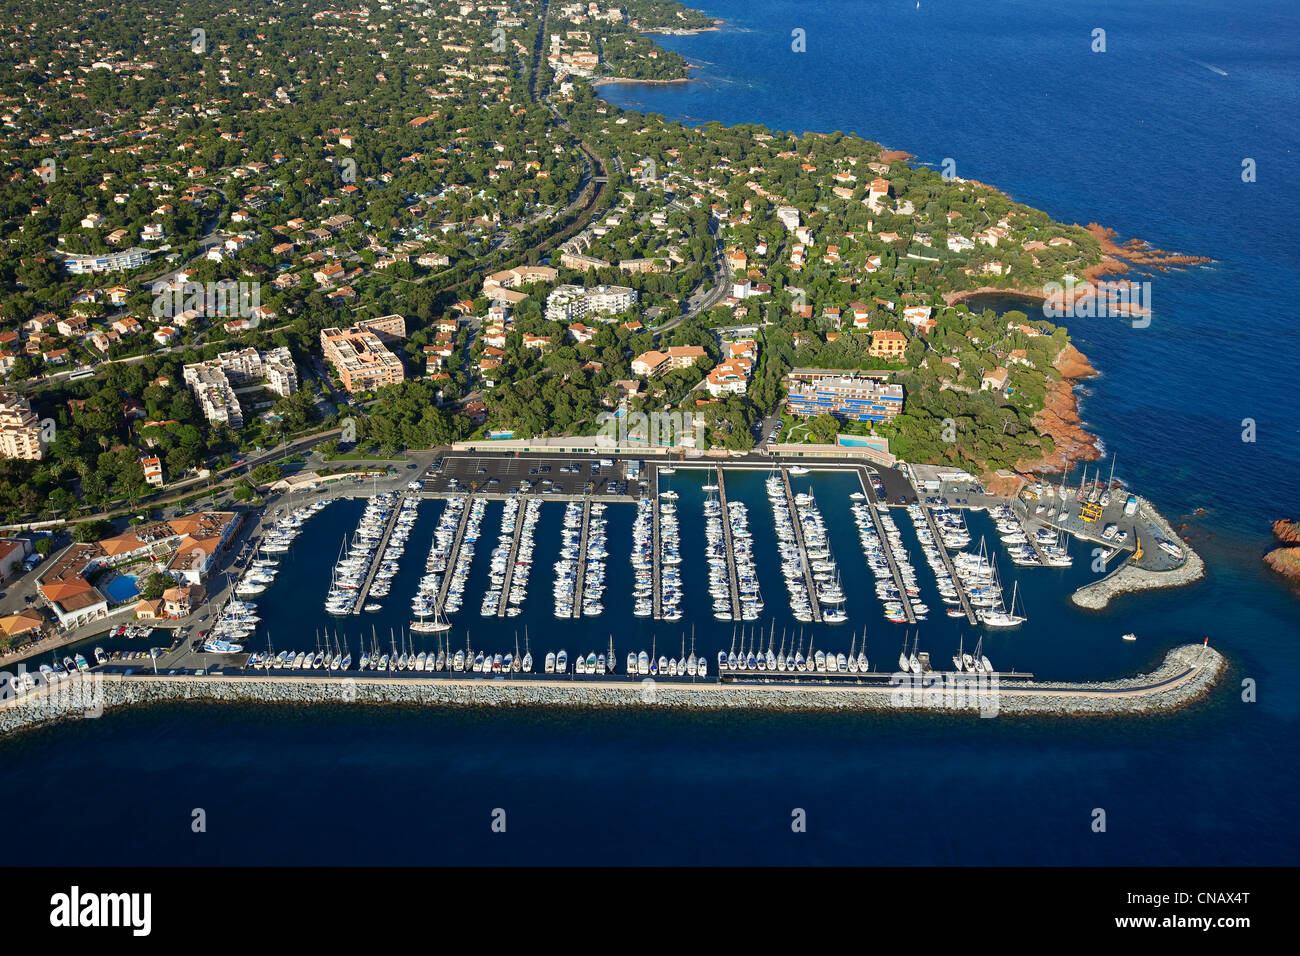 France var saint raphael port of santa lucia aerial view stock photo royalty free image - Restaurants port santa lucia saint raphael ...